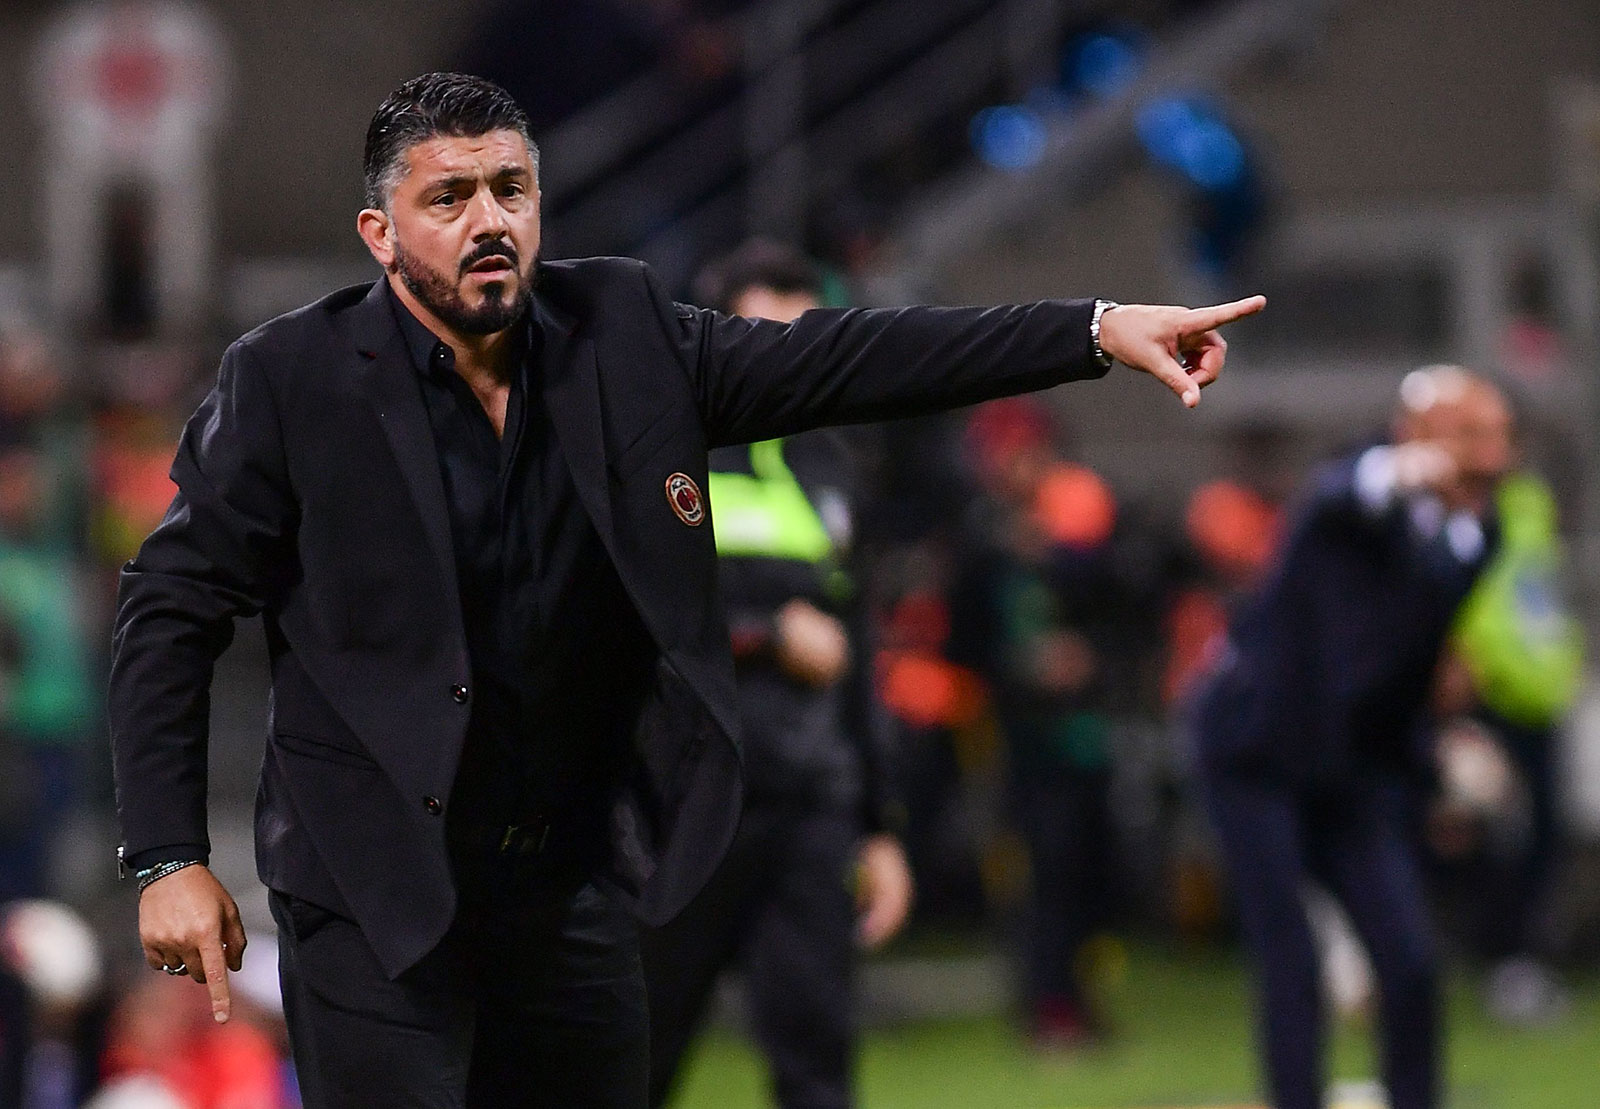 Gennaro Gattuso during Inter-Milan at Stadio San Siro on October 21, 2018. (MARCO BERTORELLO/AFP/Getty Images)